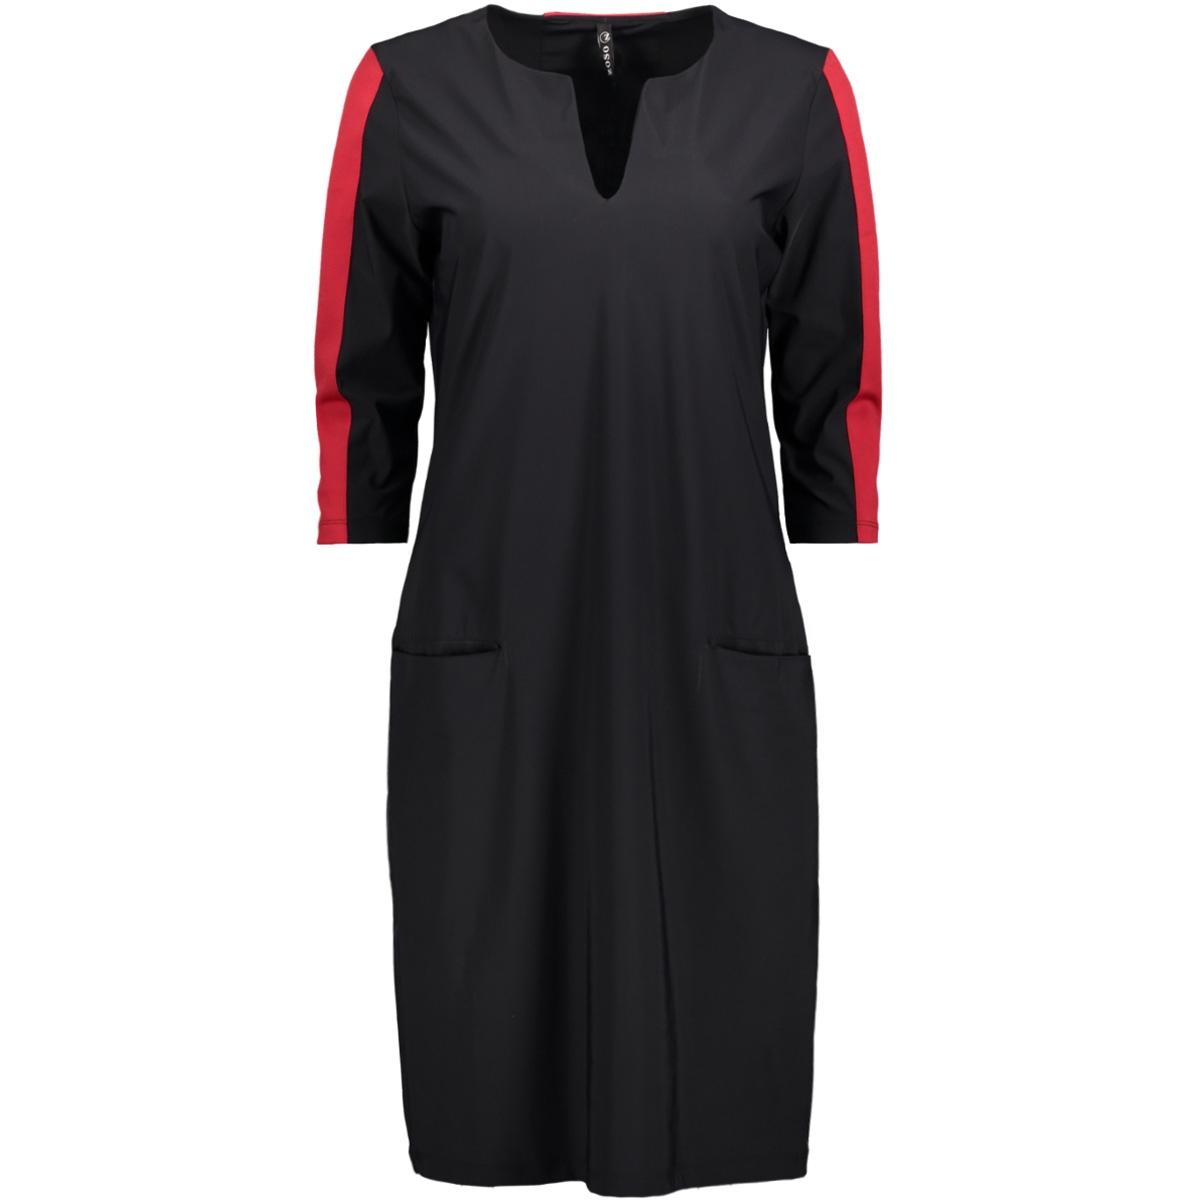 mars zoso jurk black/red